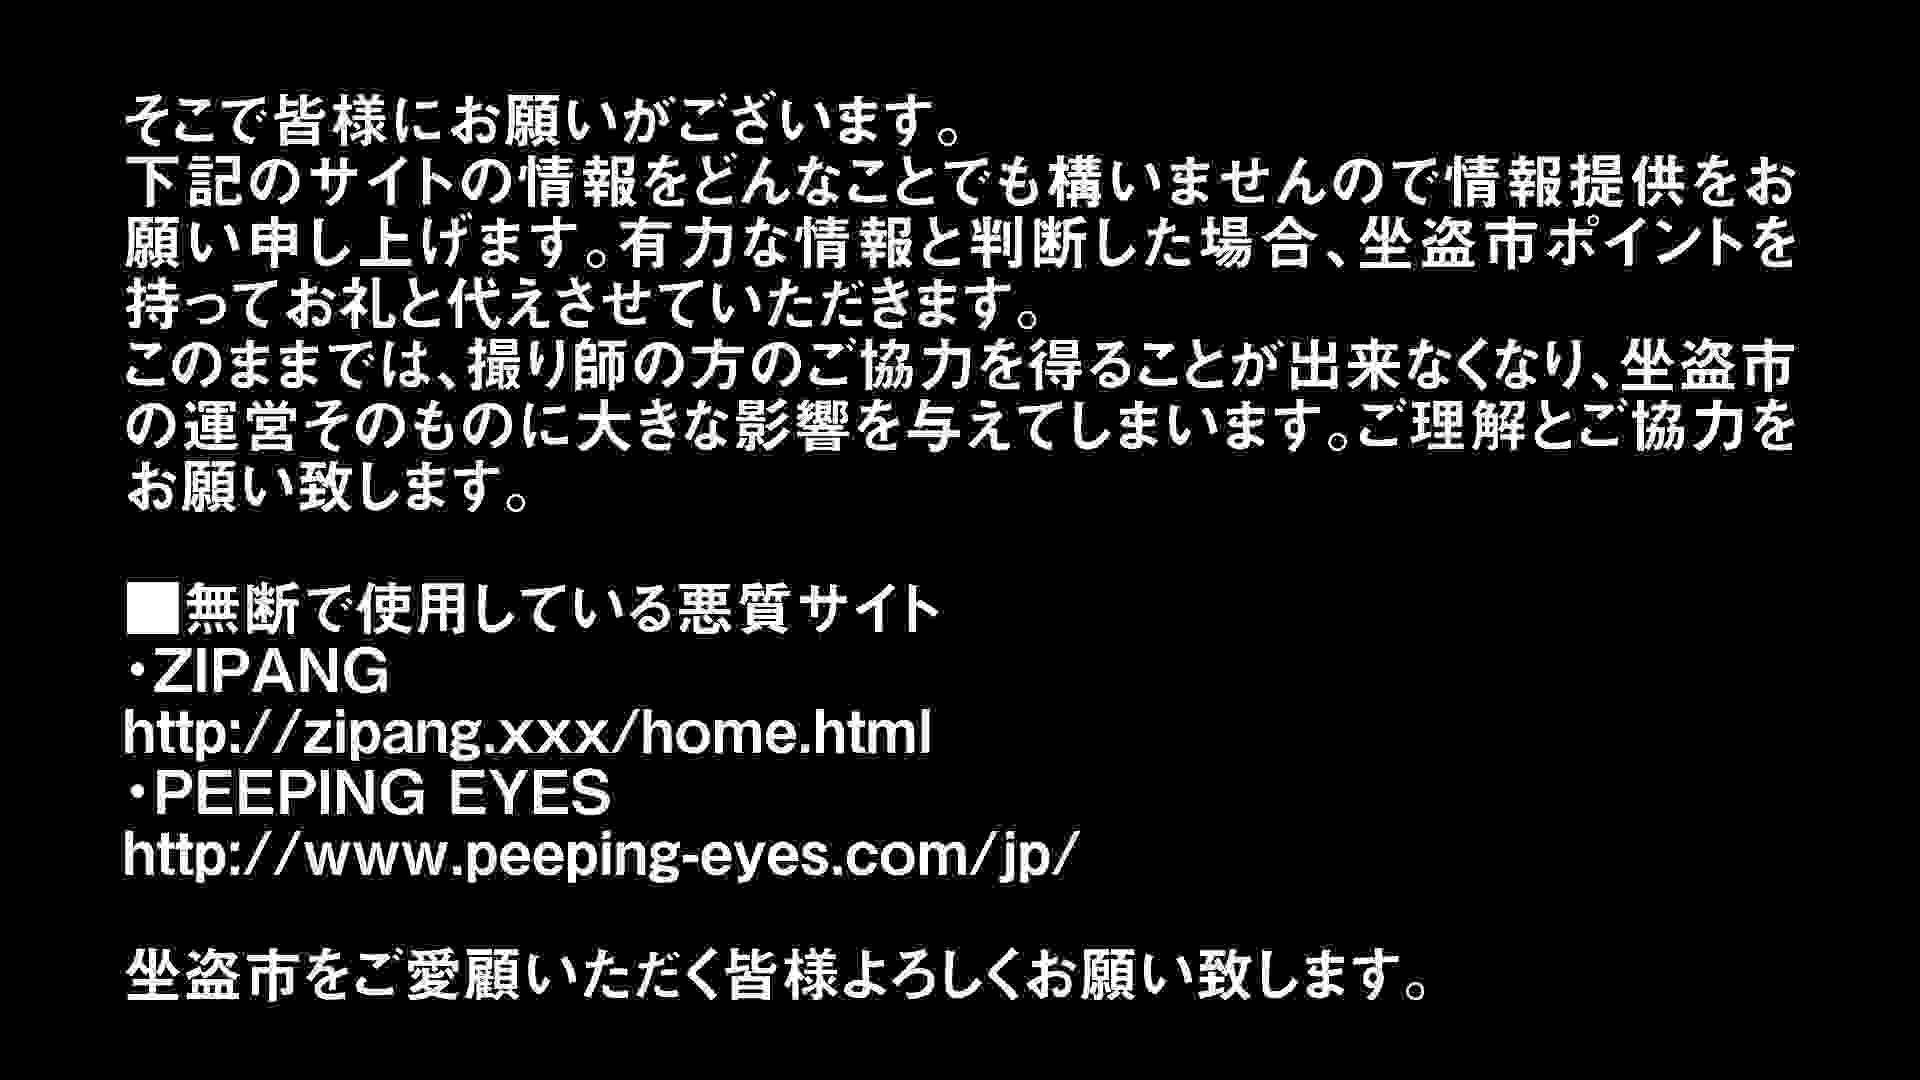 Aquaな露天風呂Vol.299 盗撮シリーズ | 露天風呂編  82PIX 33